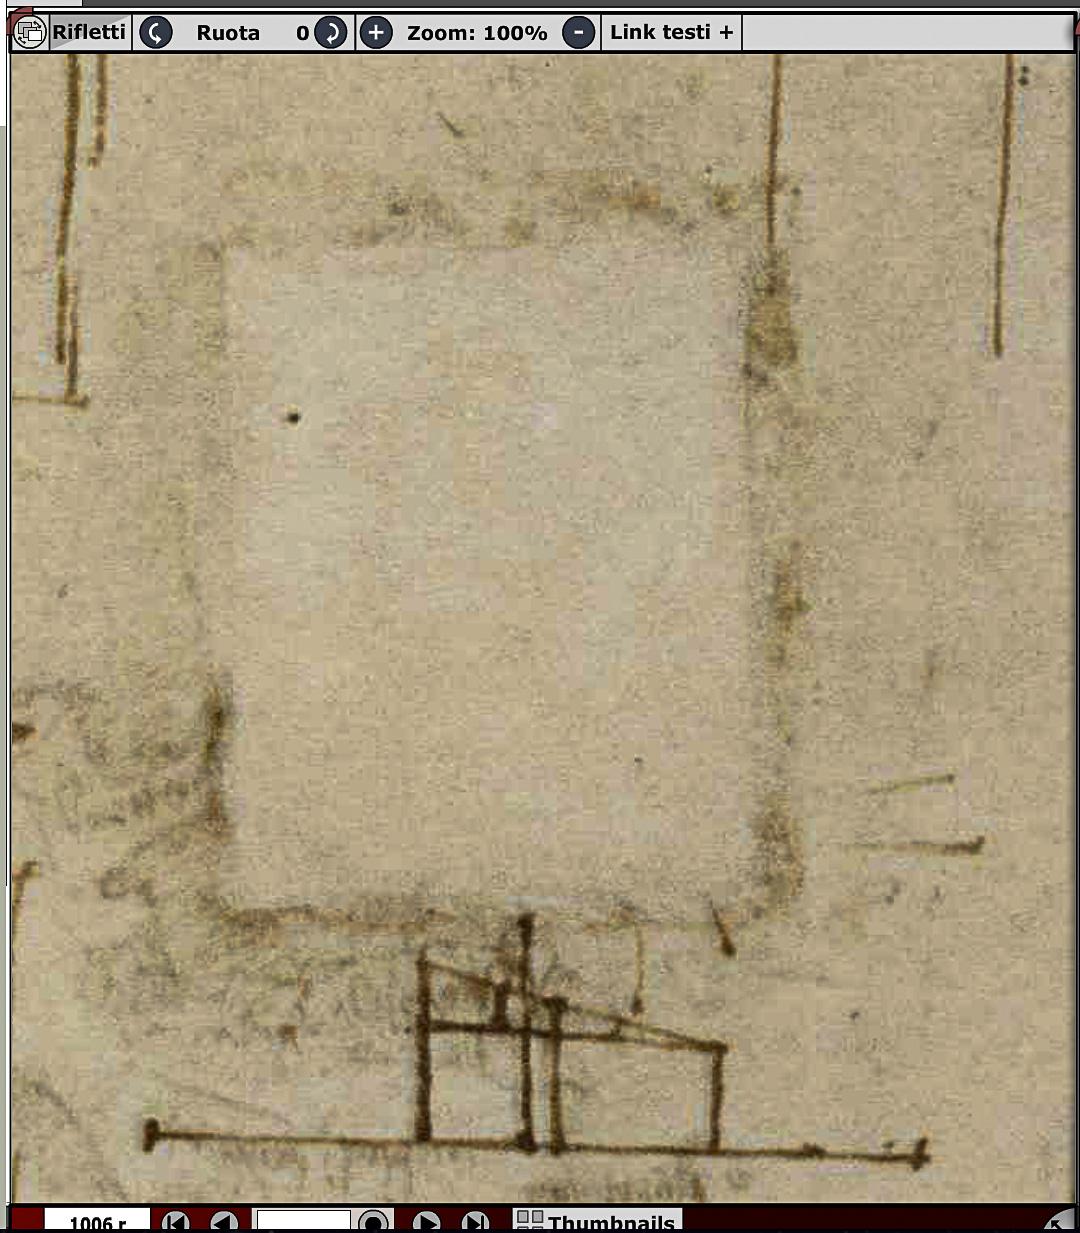 Foli 1006-R.JPG - 356.79 KB